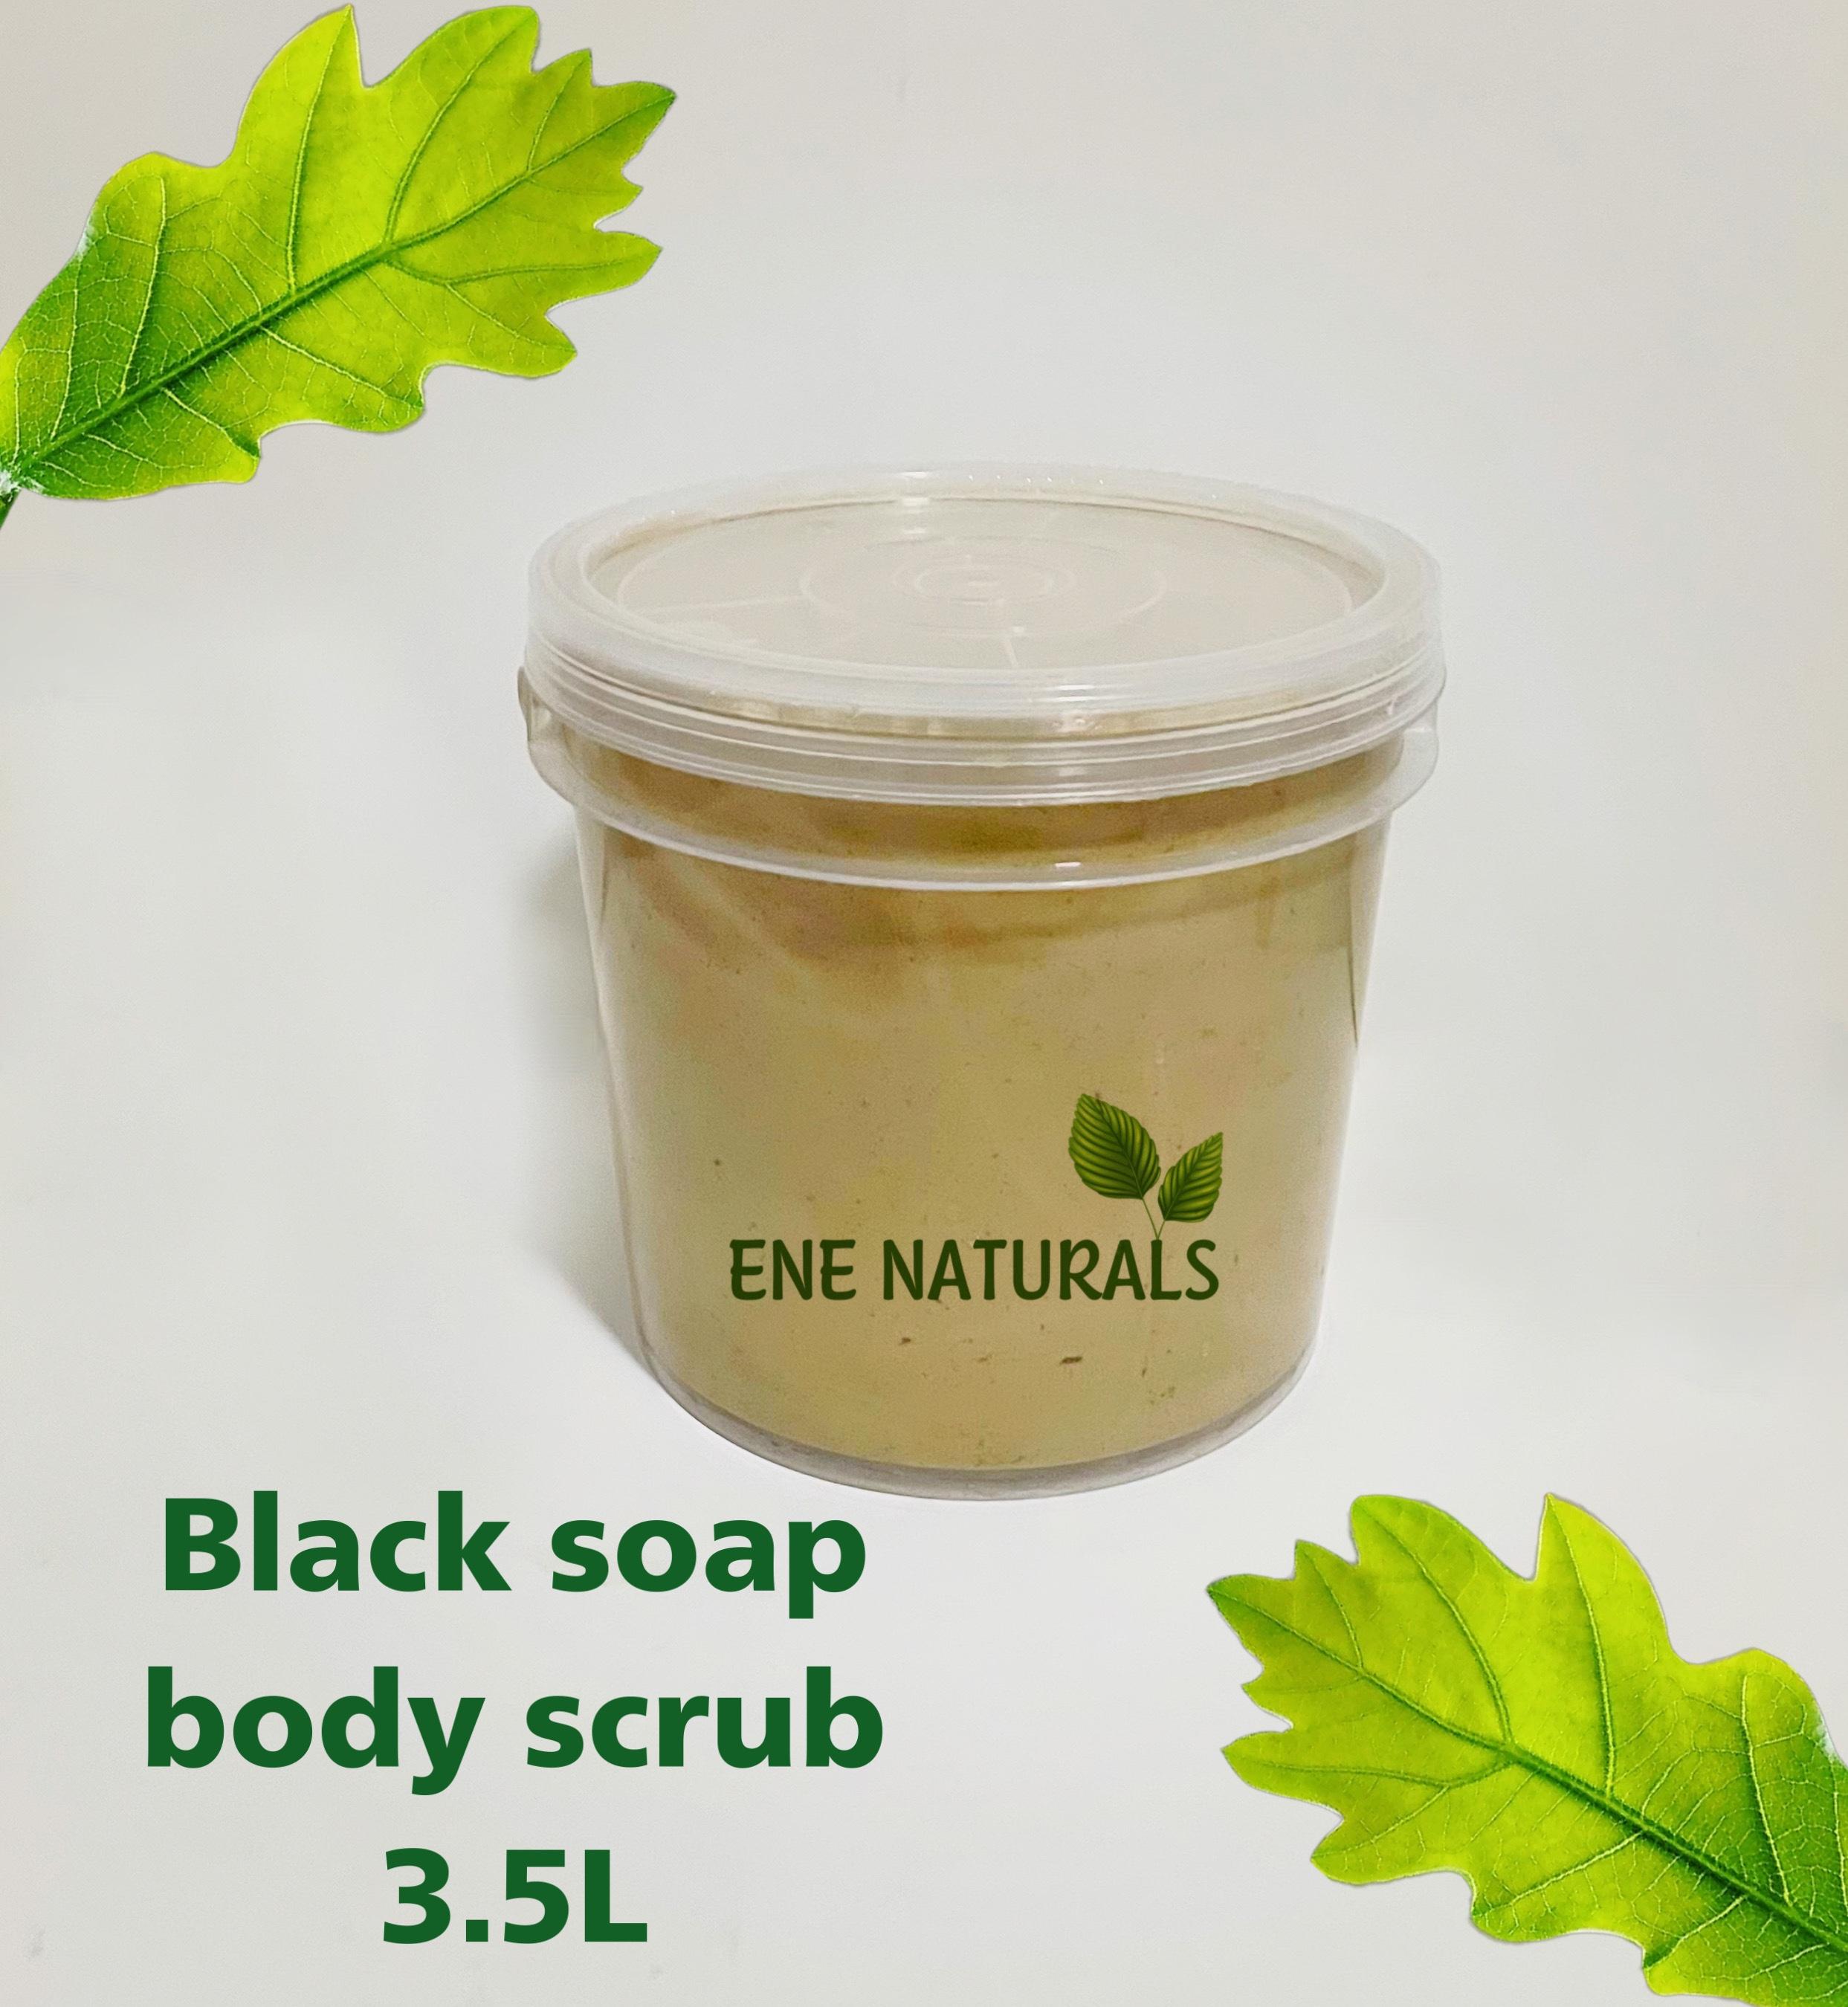 Contract manufacturing of black soap body scrub